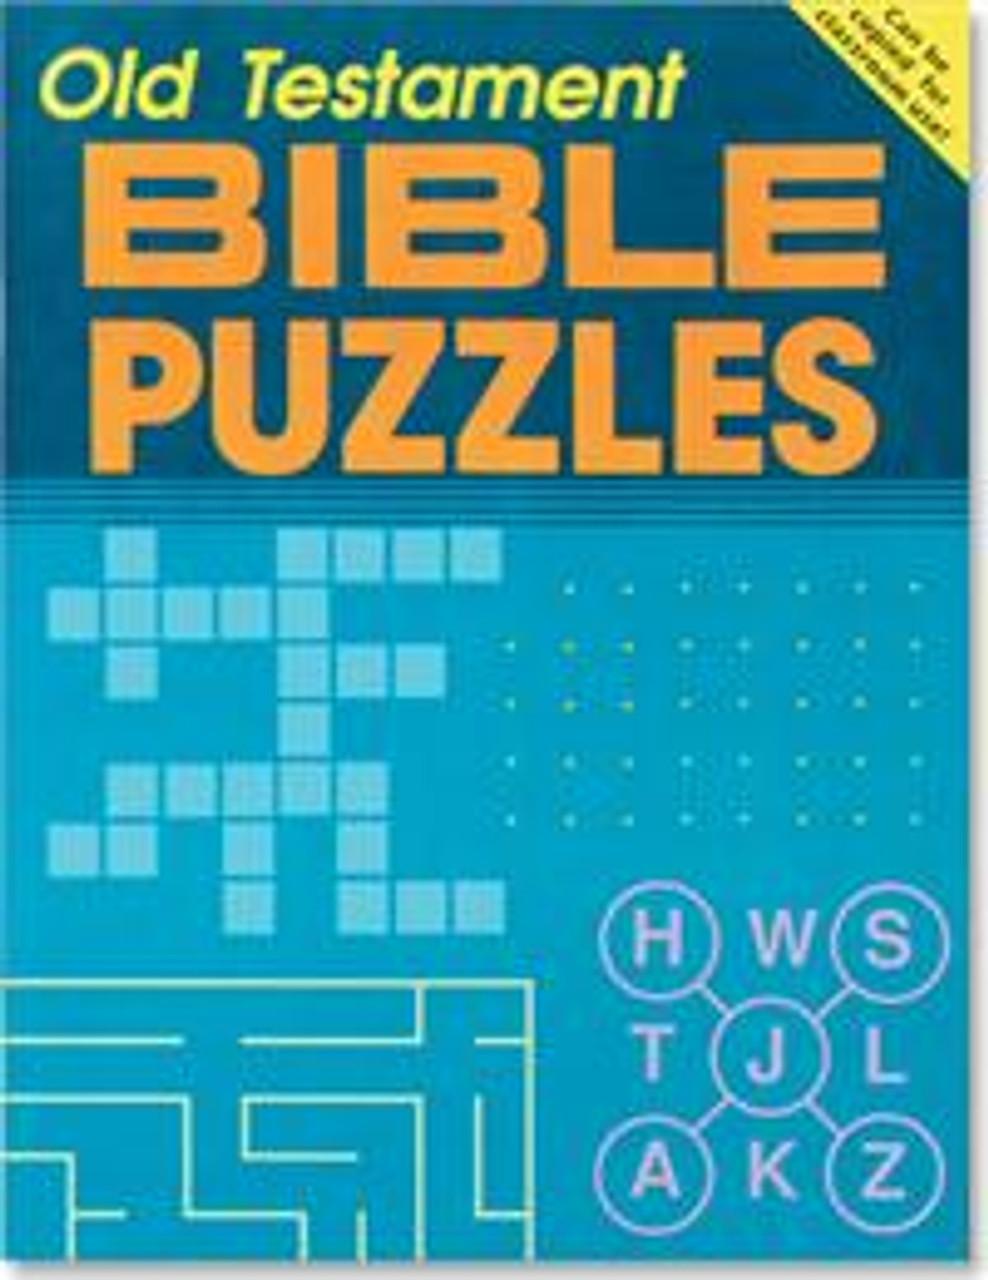 Bible Puzzles - Old Testament - Grades 4 & up